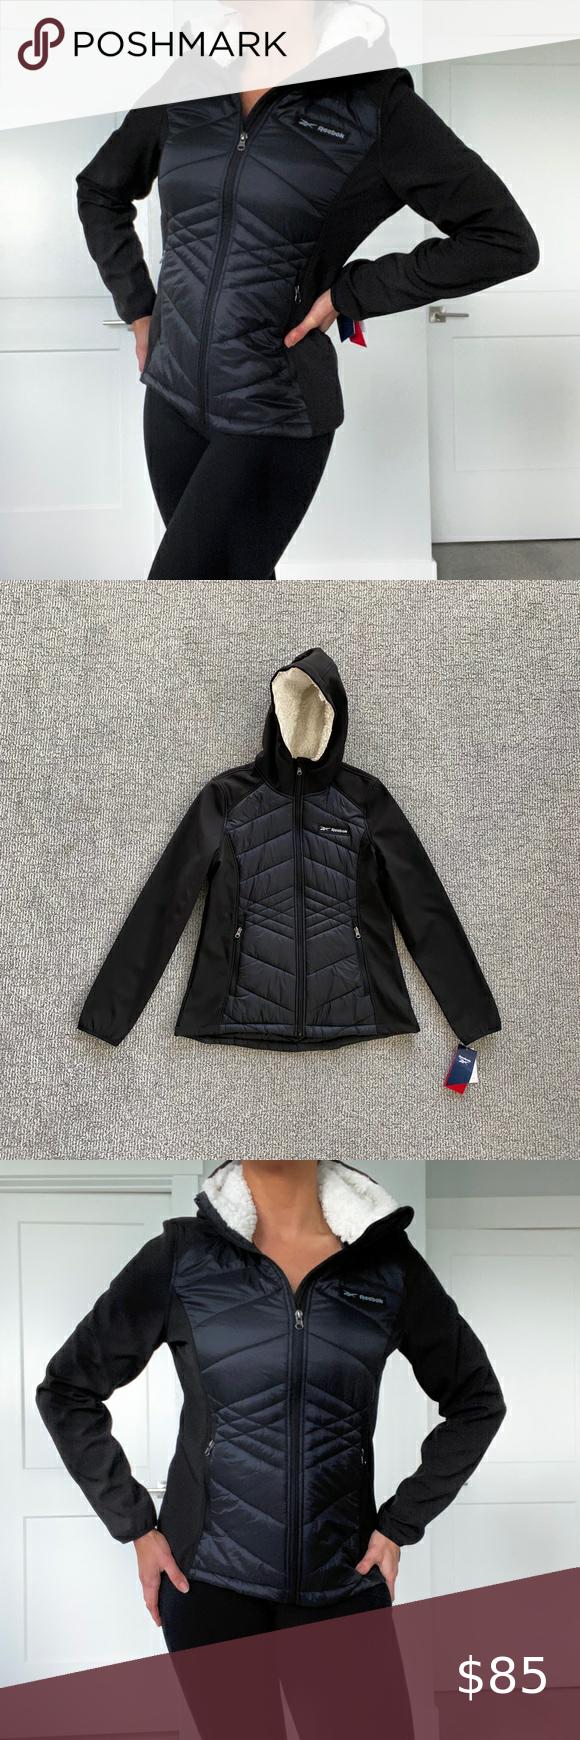 Reebok Black Puffer Jacket Black Puffer Jacket Puffer Jacket Women Black Puffer [ 1740 x 580 Pixel ]